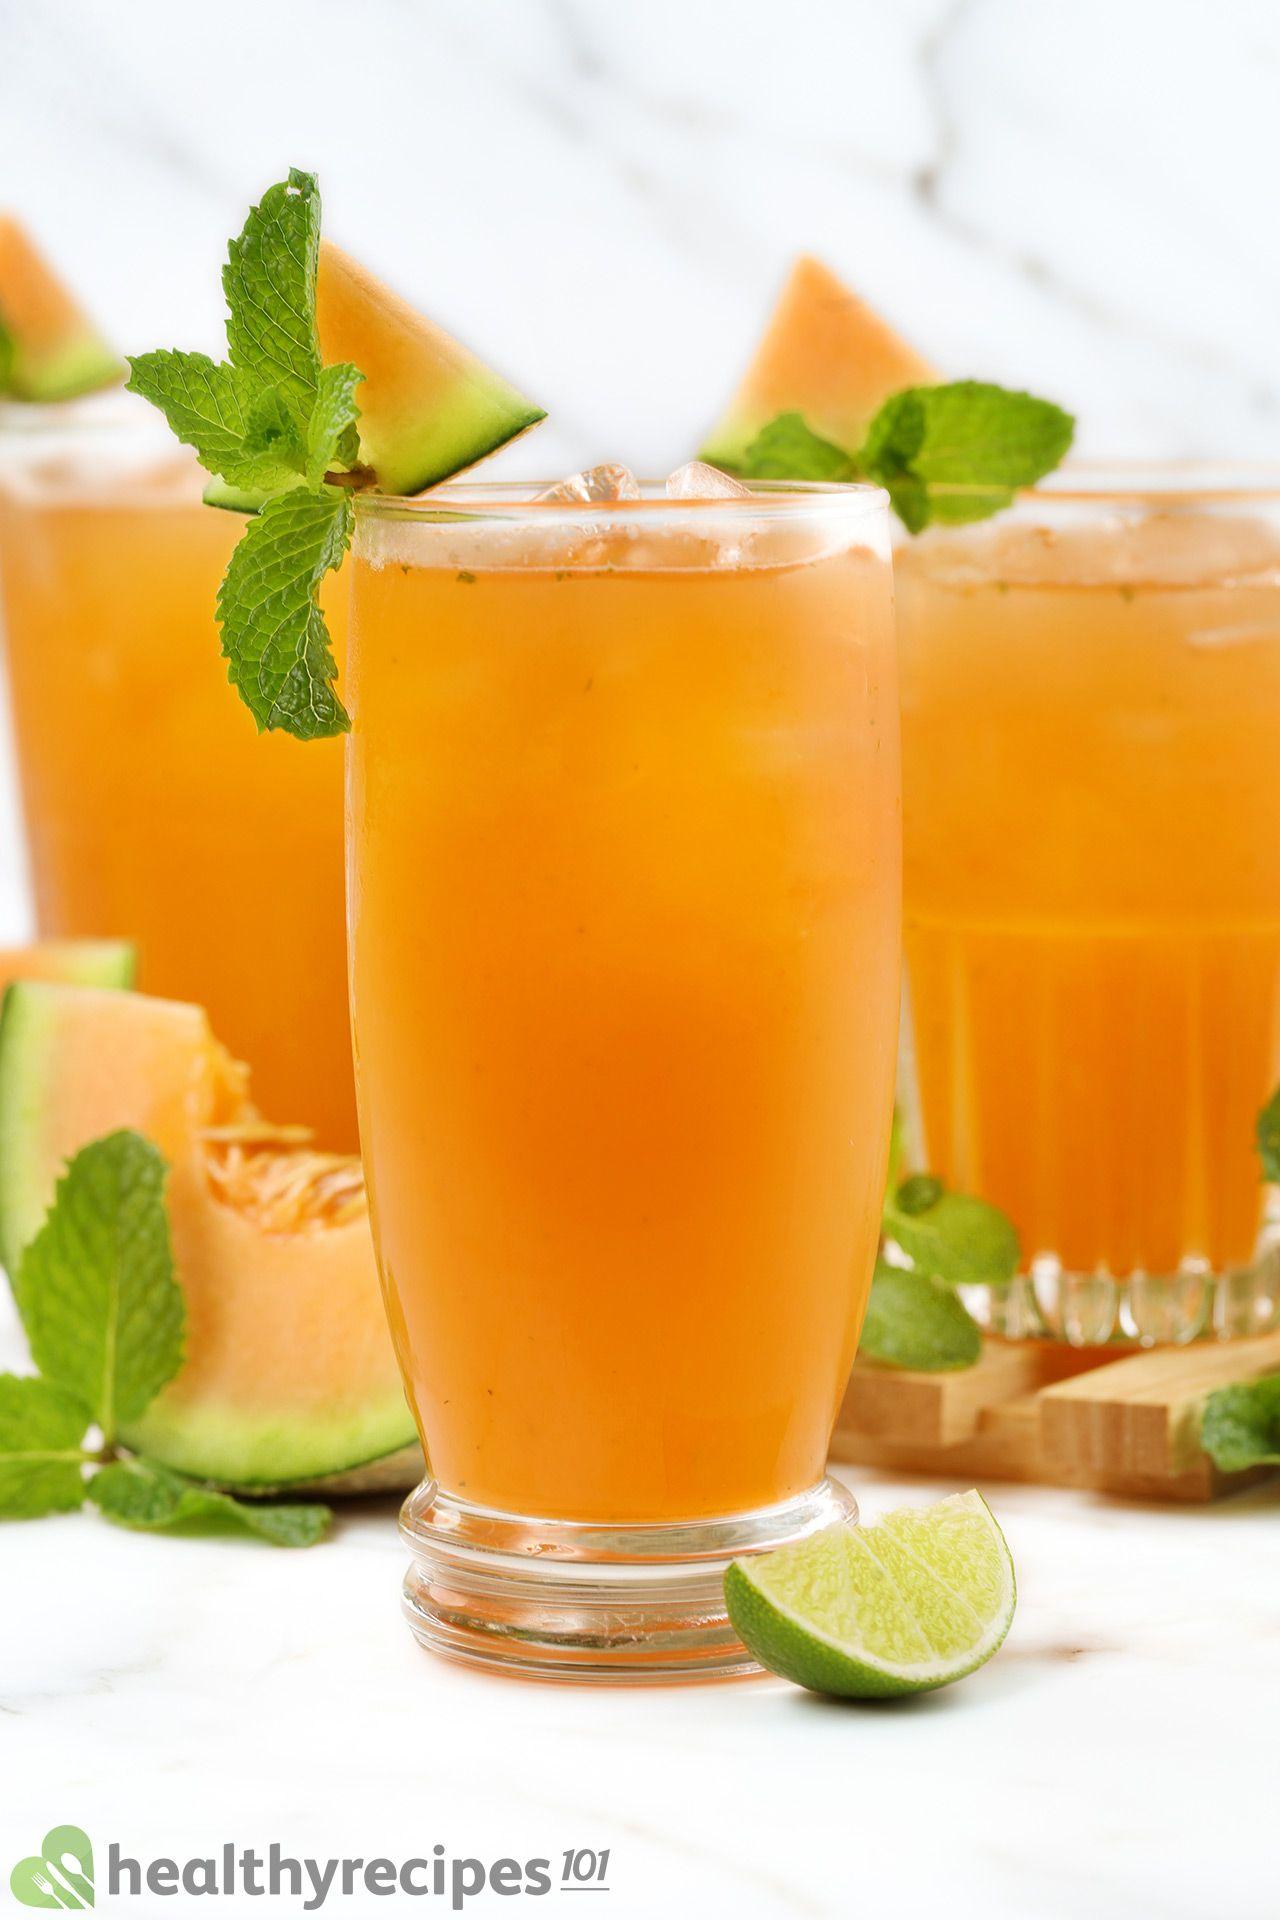 homemade cantaloupe juice recipe